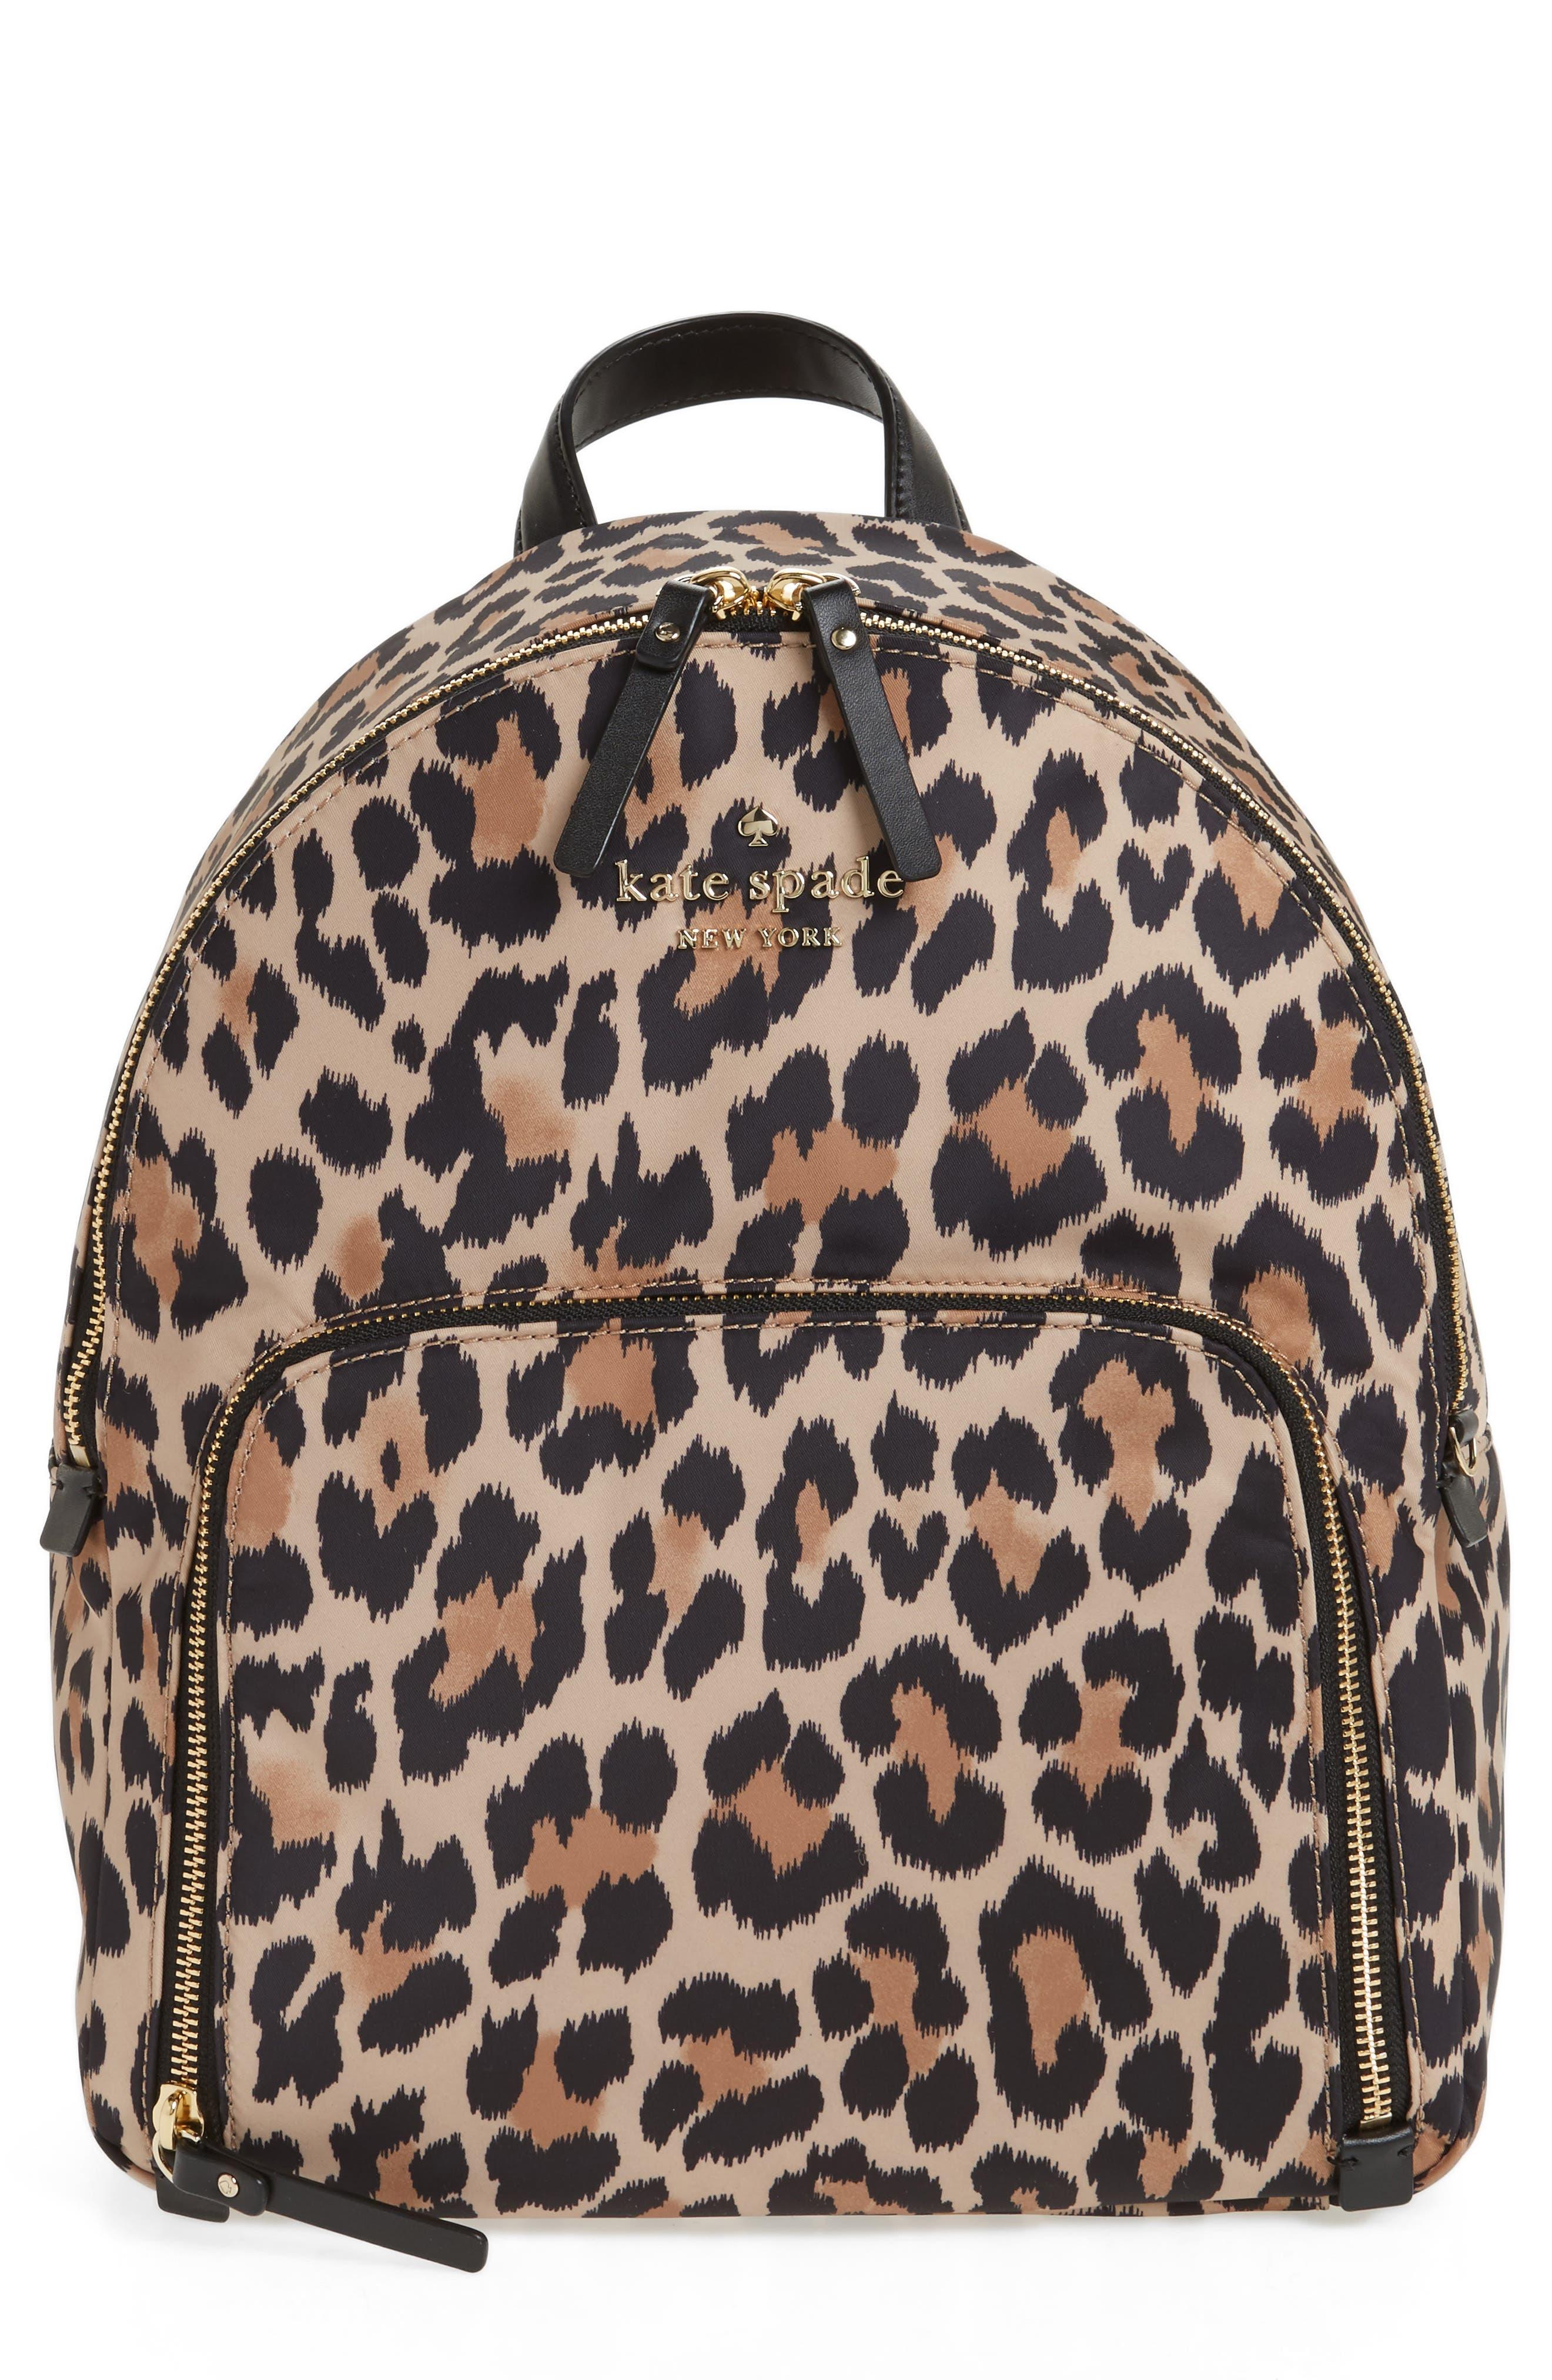 kate spade new york watson lane - hartley leopard print backpack